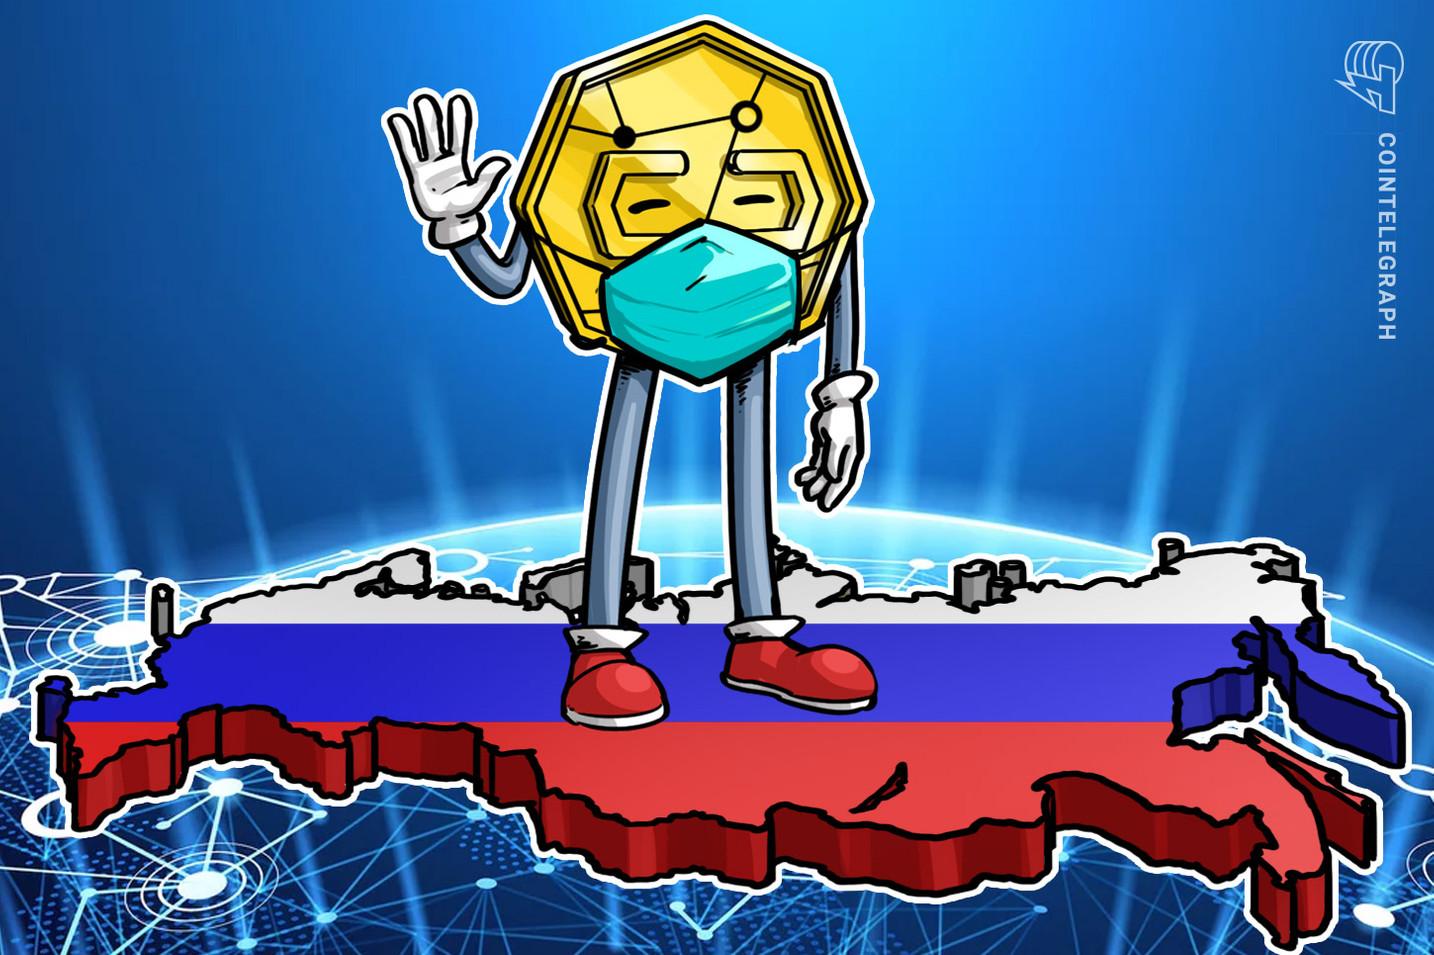 Coronavirus Lockdown Boosts Bitcoin Trading in Russia